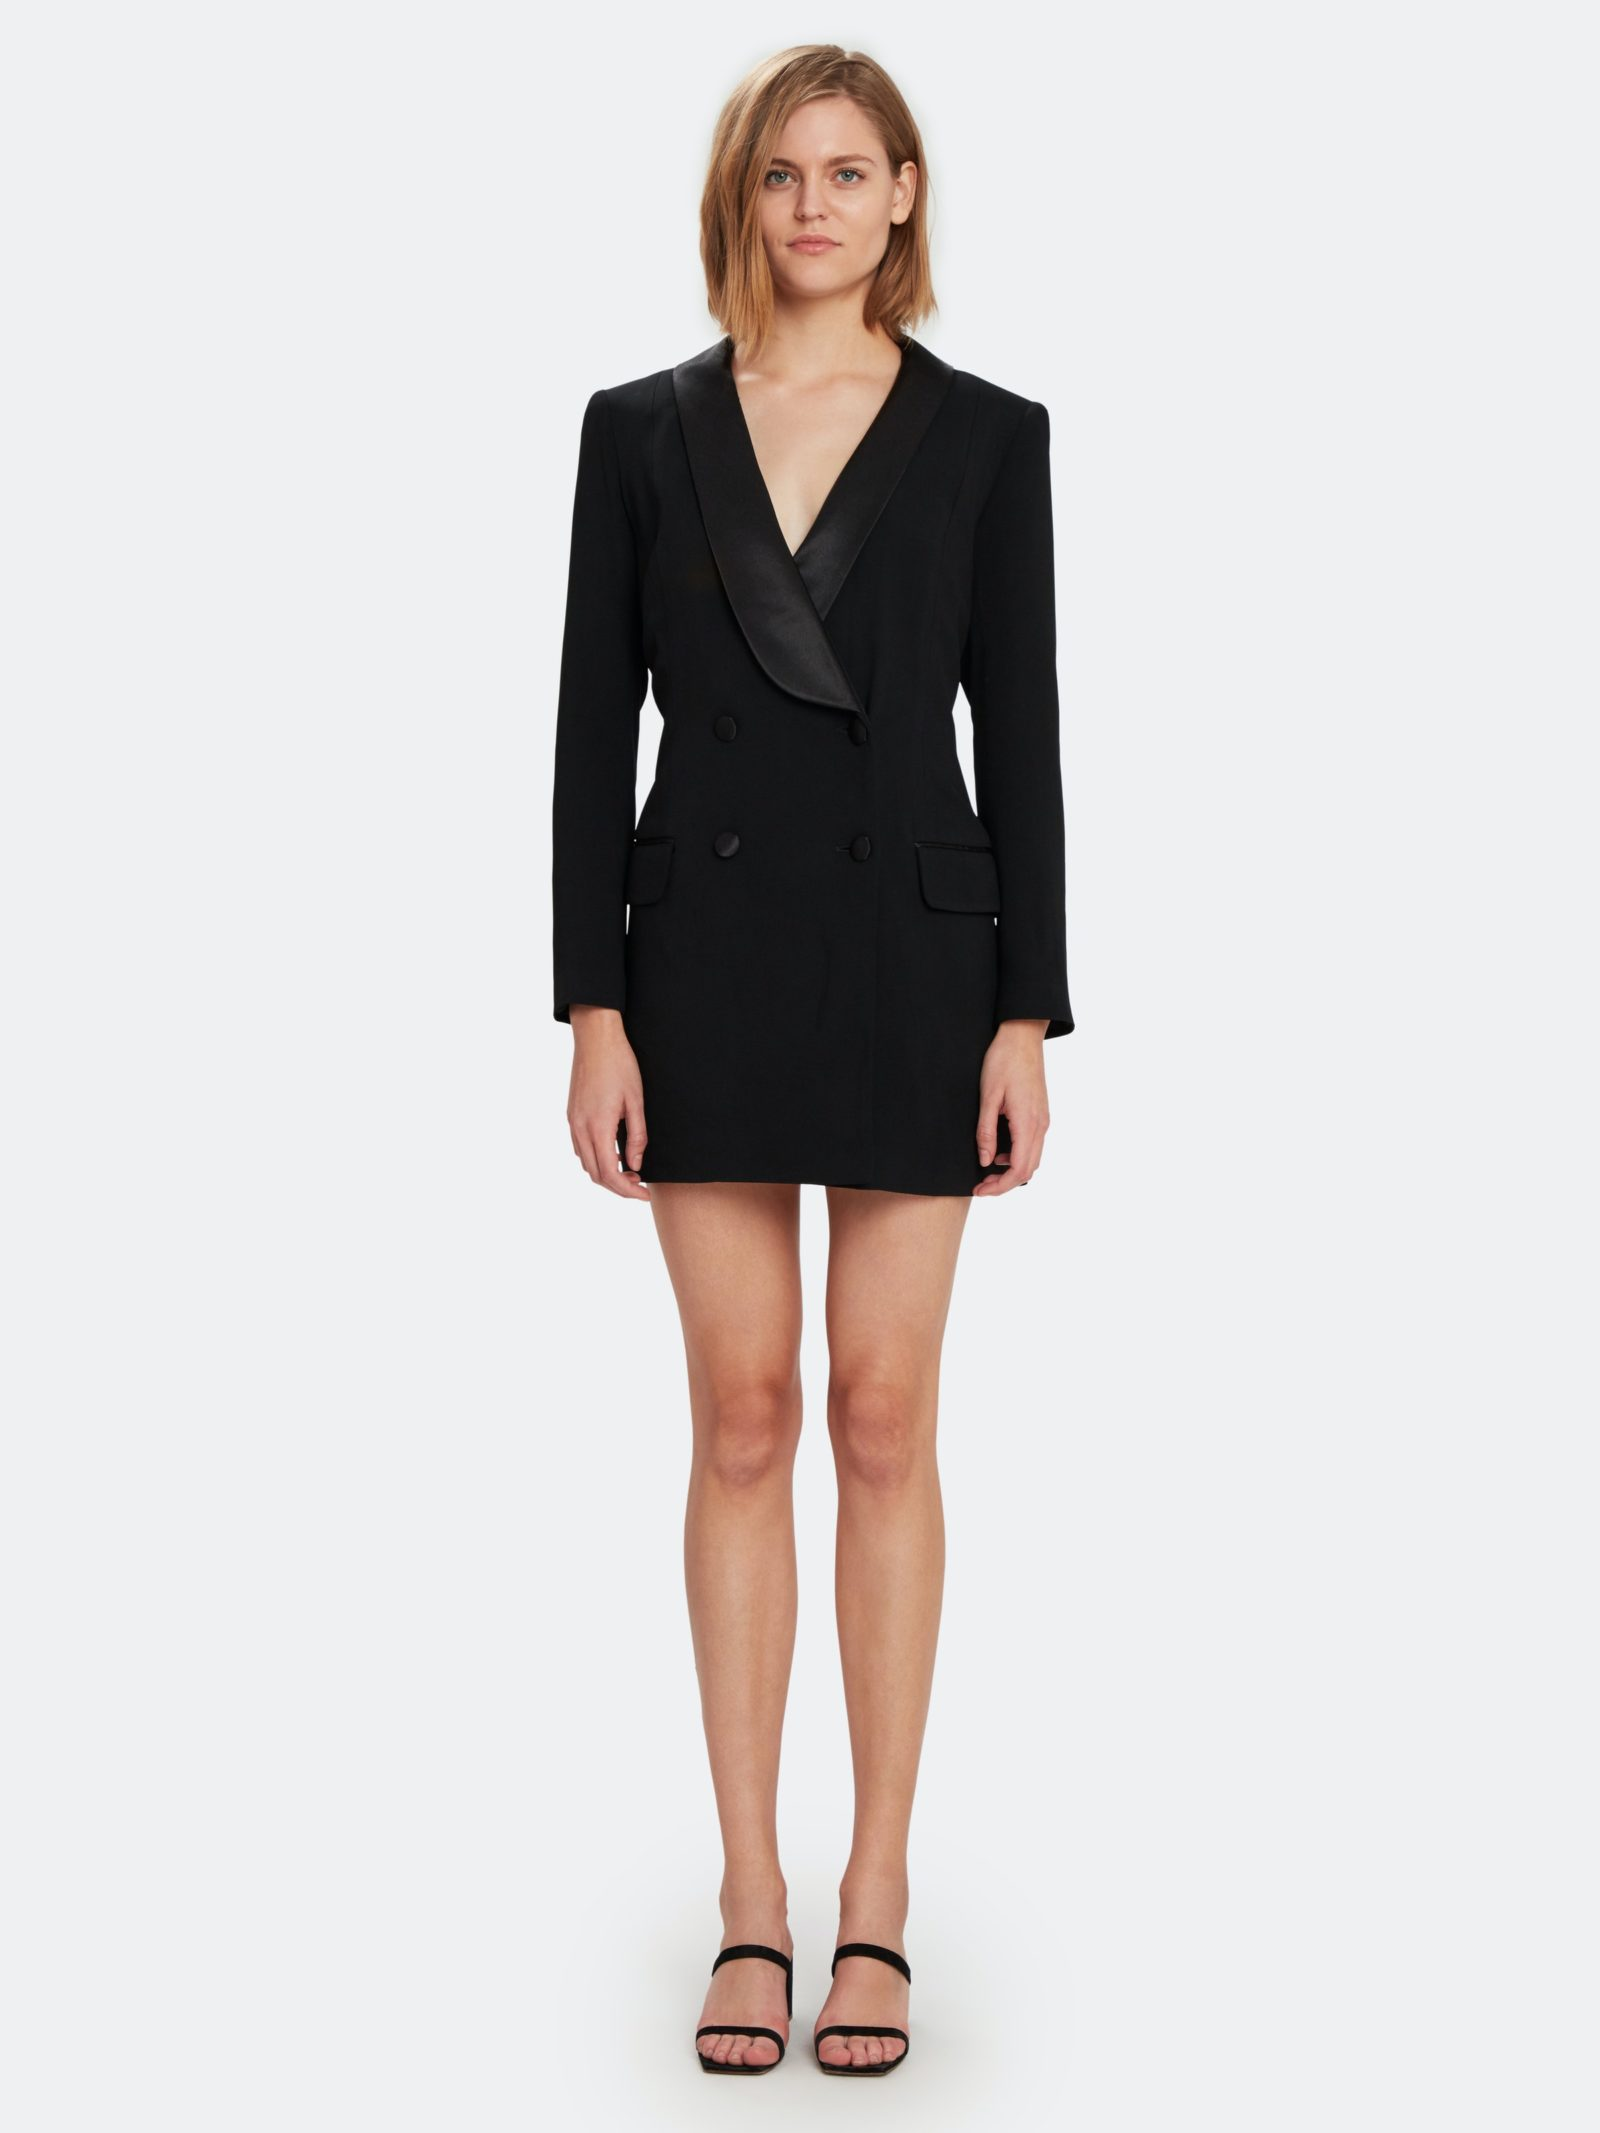 Verishop's Up To 80% Off Sale dress